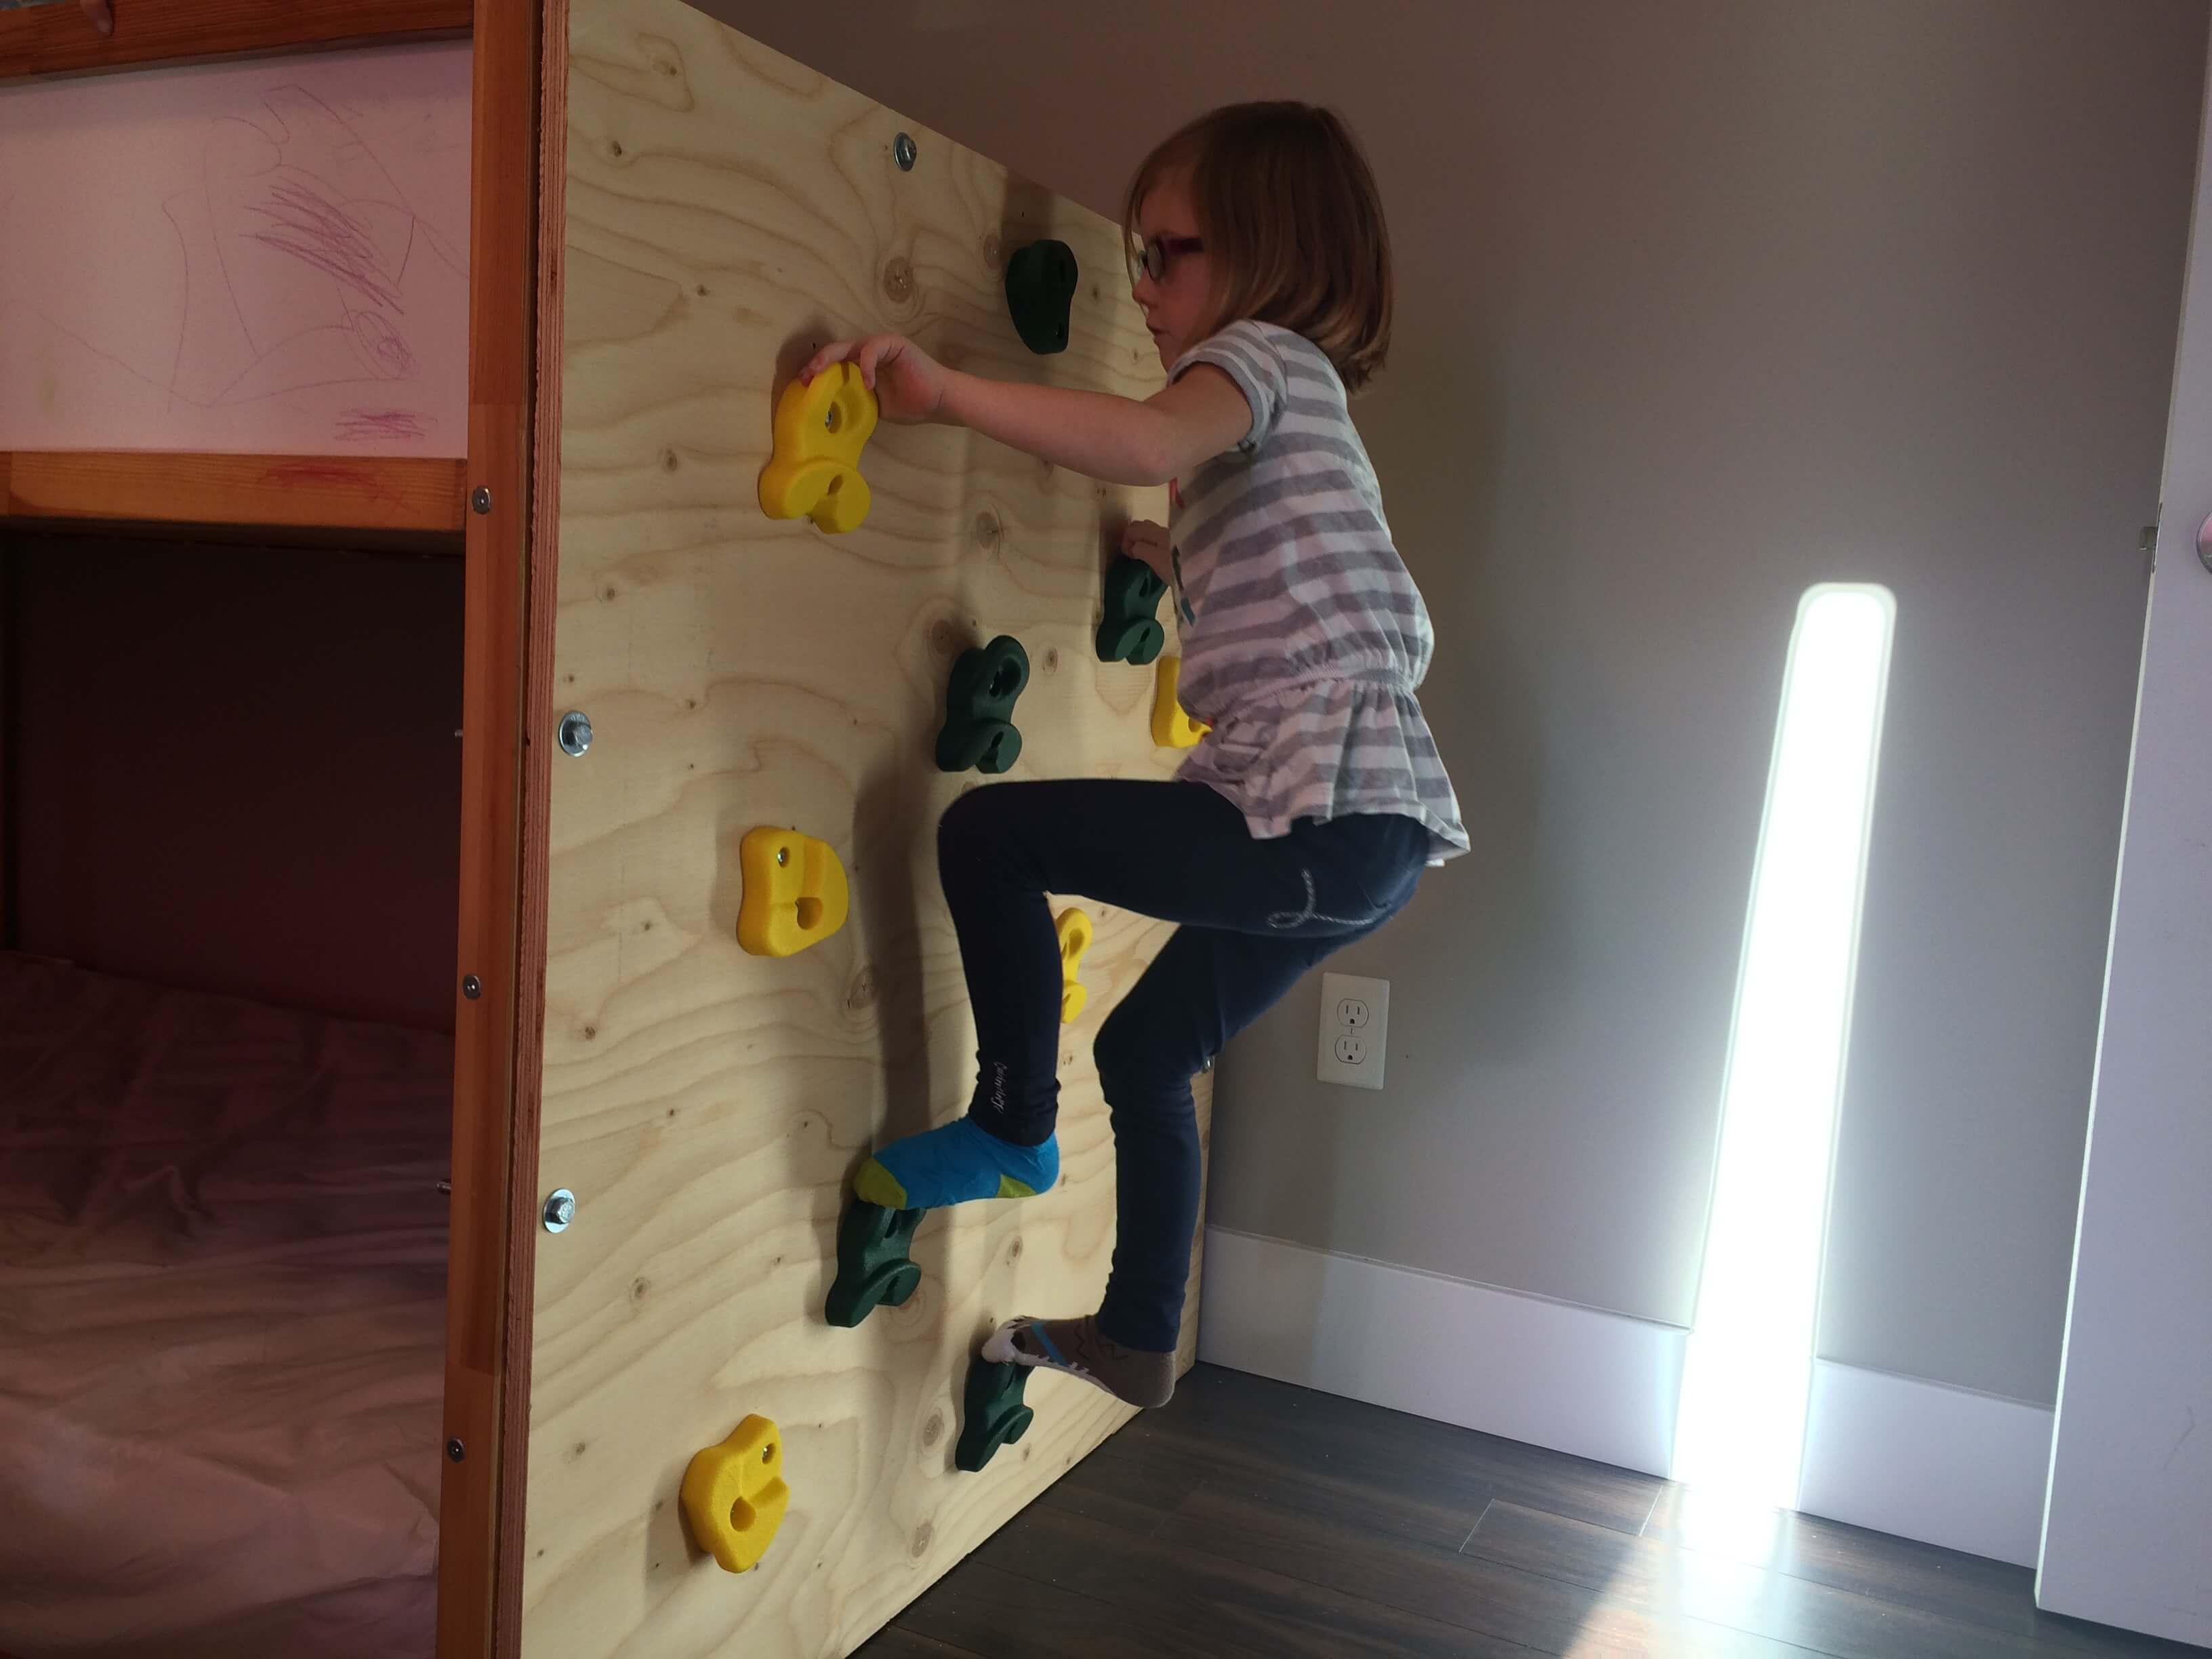 Ikea Kura Bed Climbing Wall Hack As Time Flies